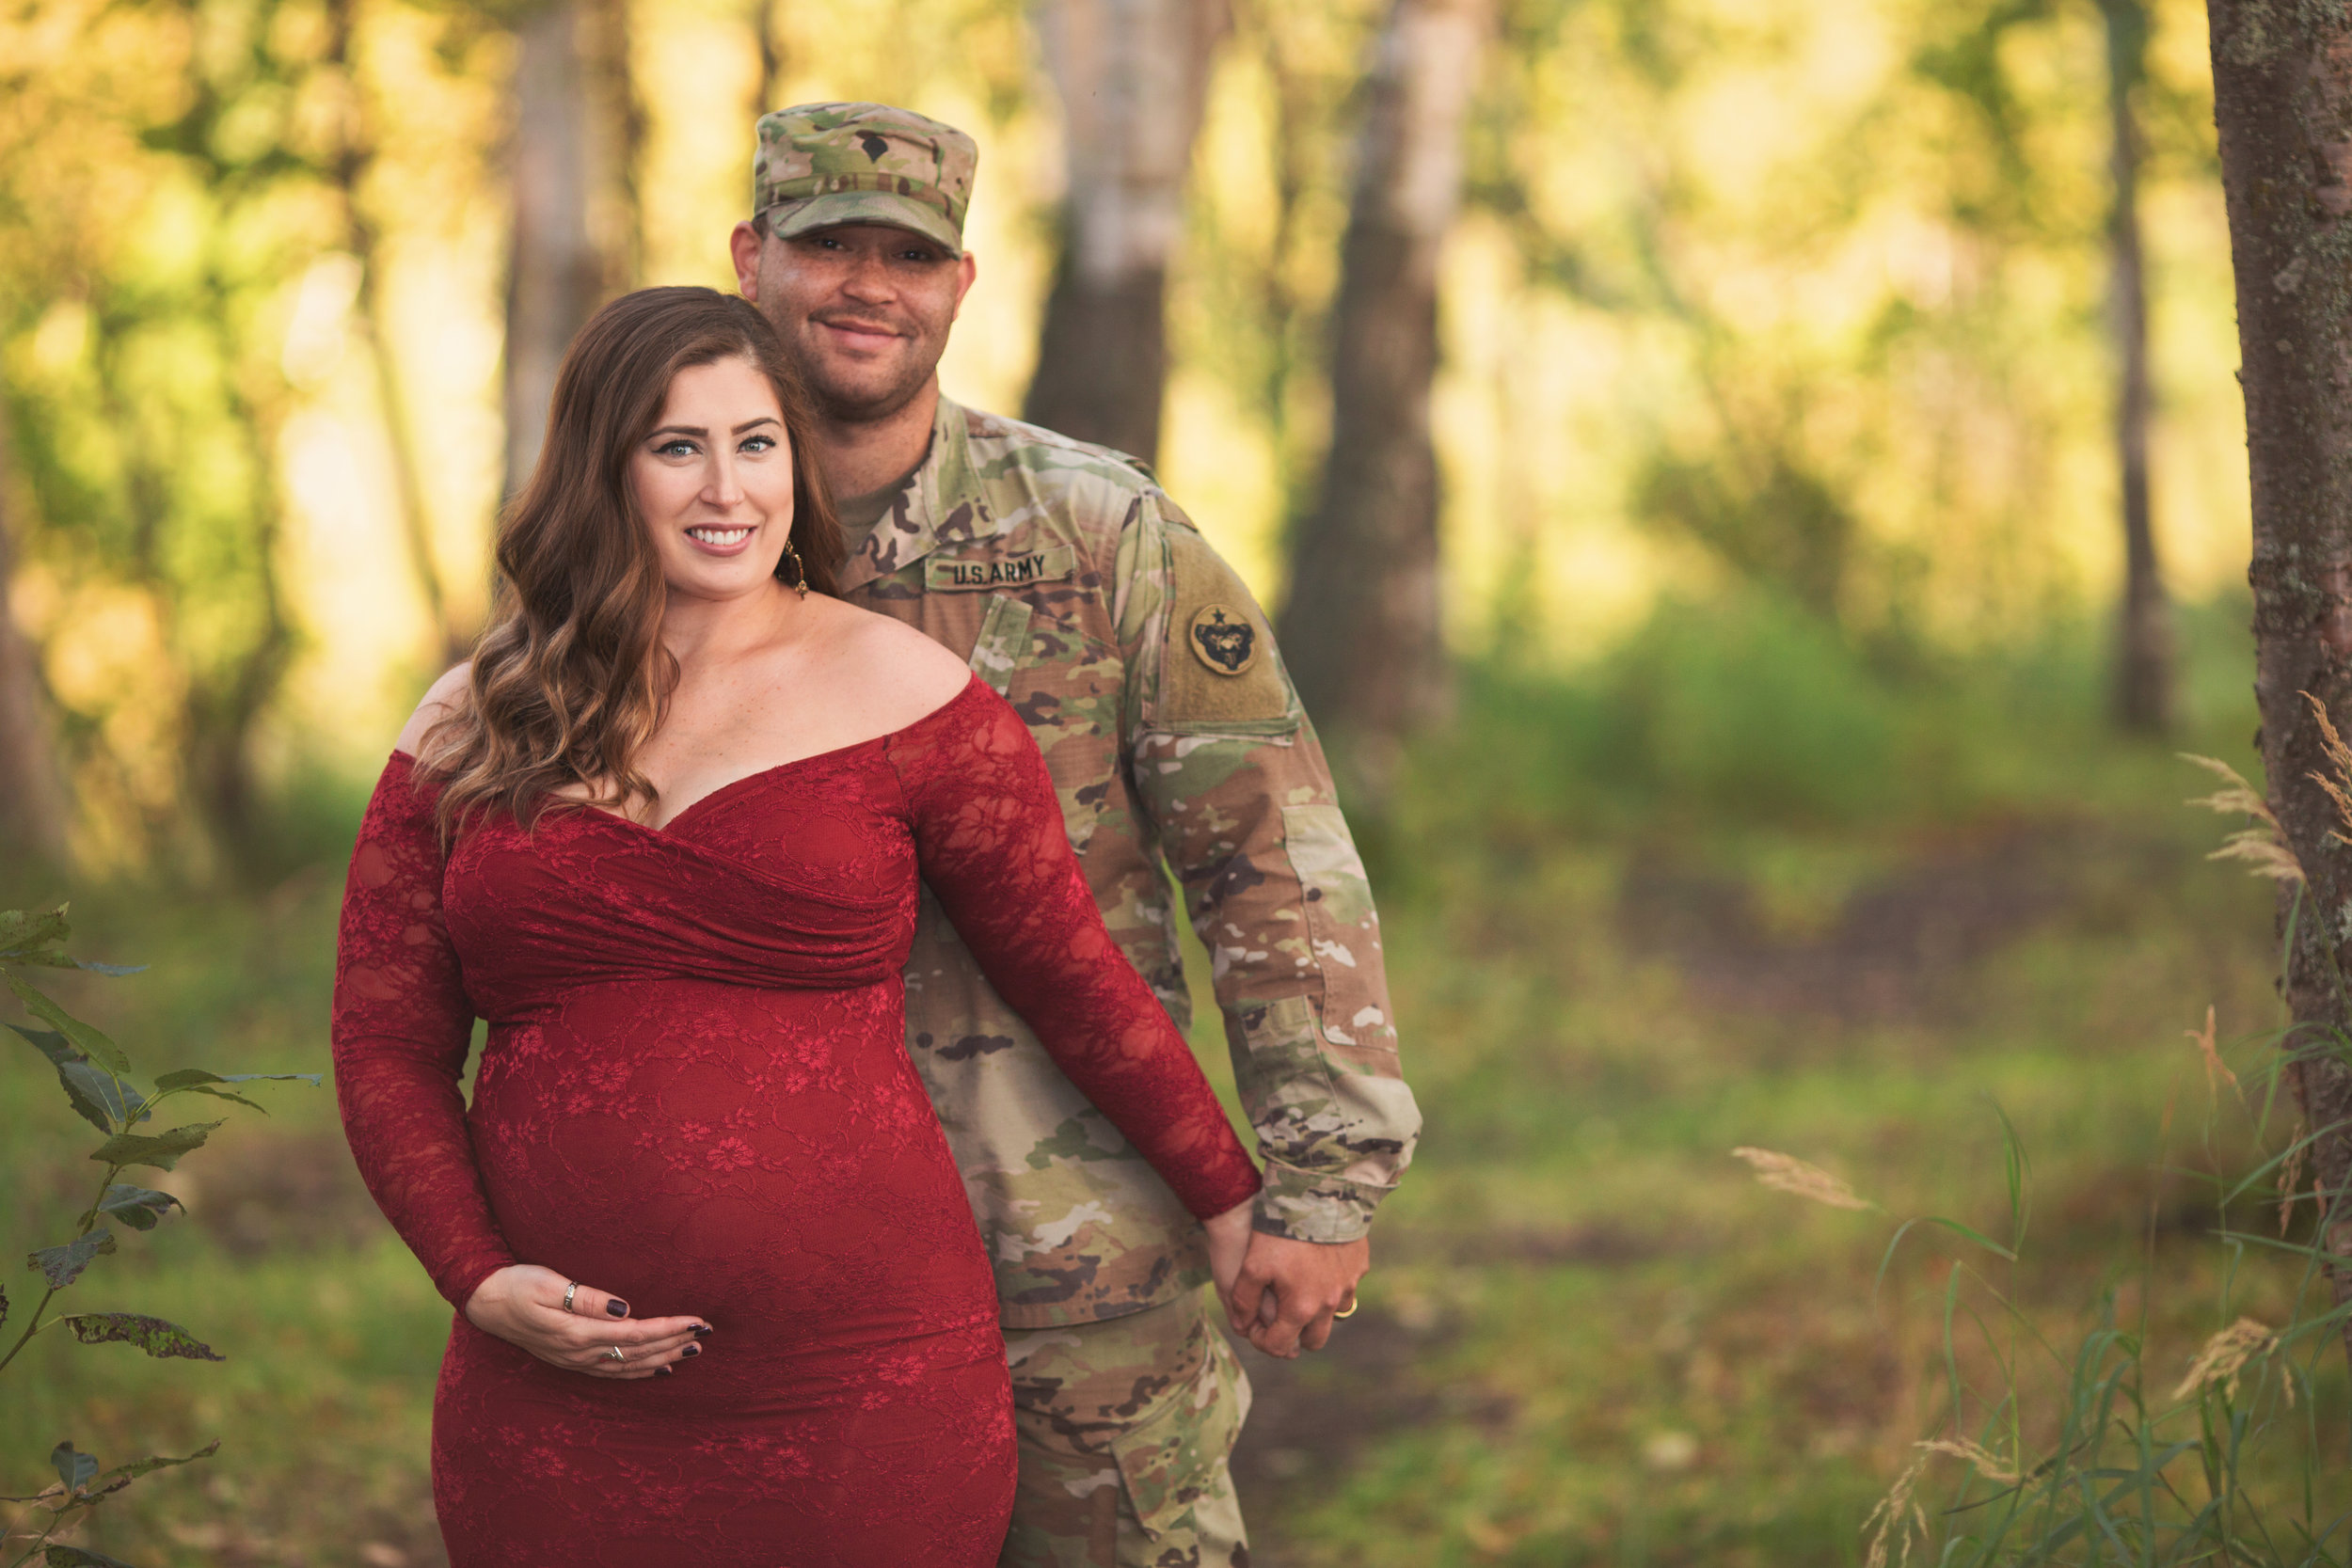 anchorage-maternity-photographer-4.jpg